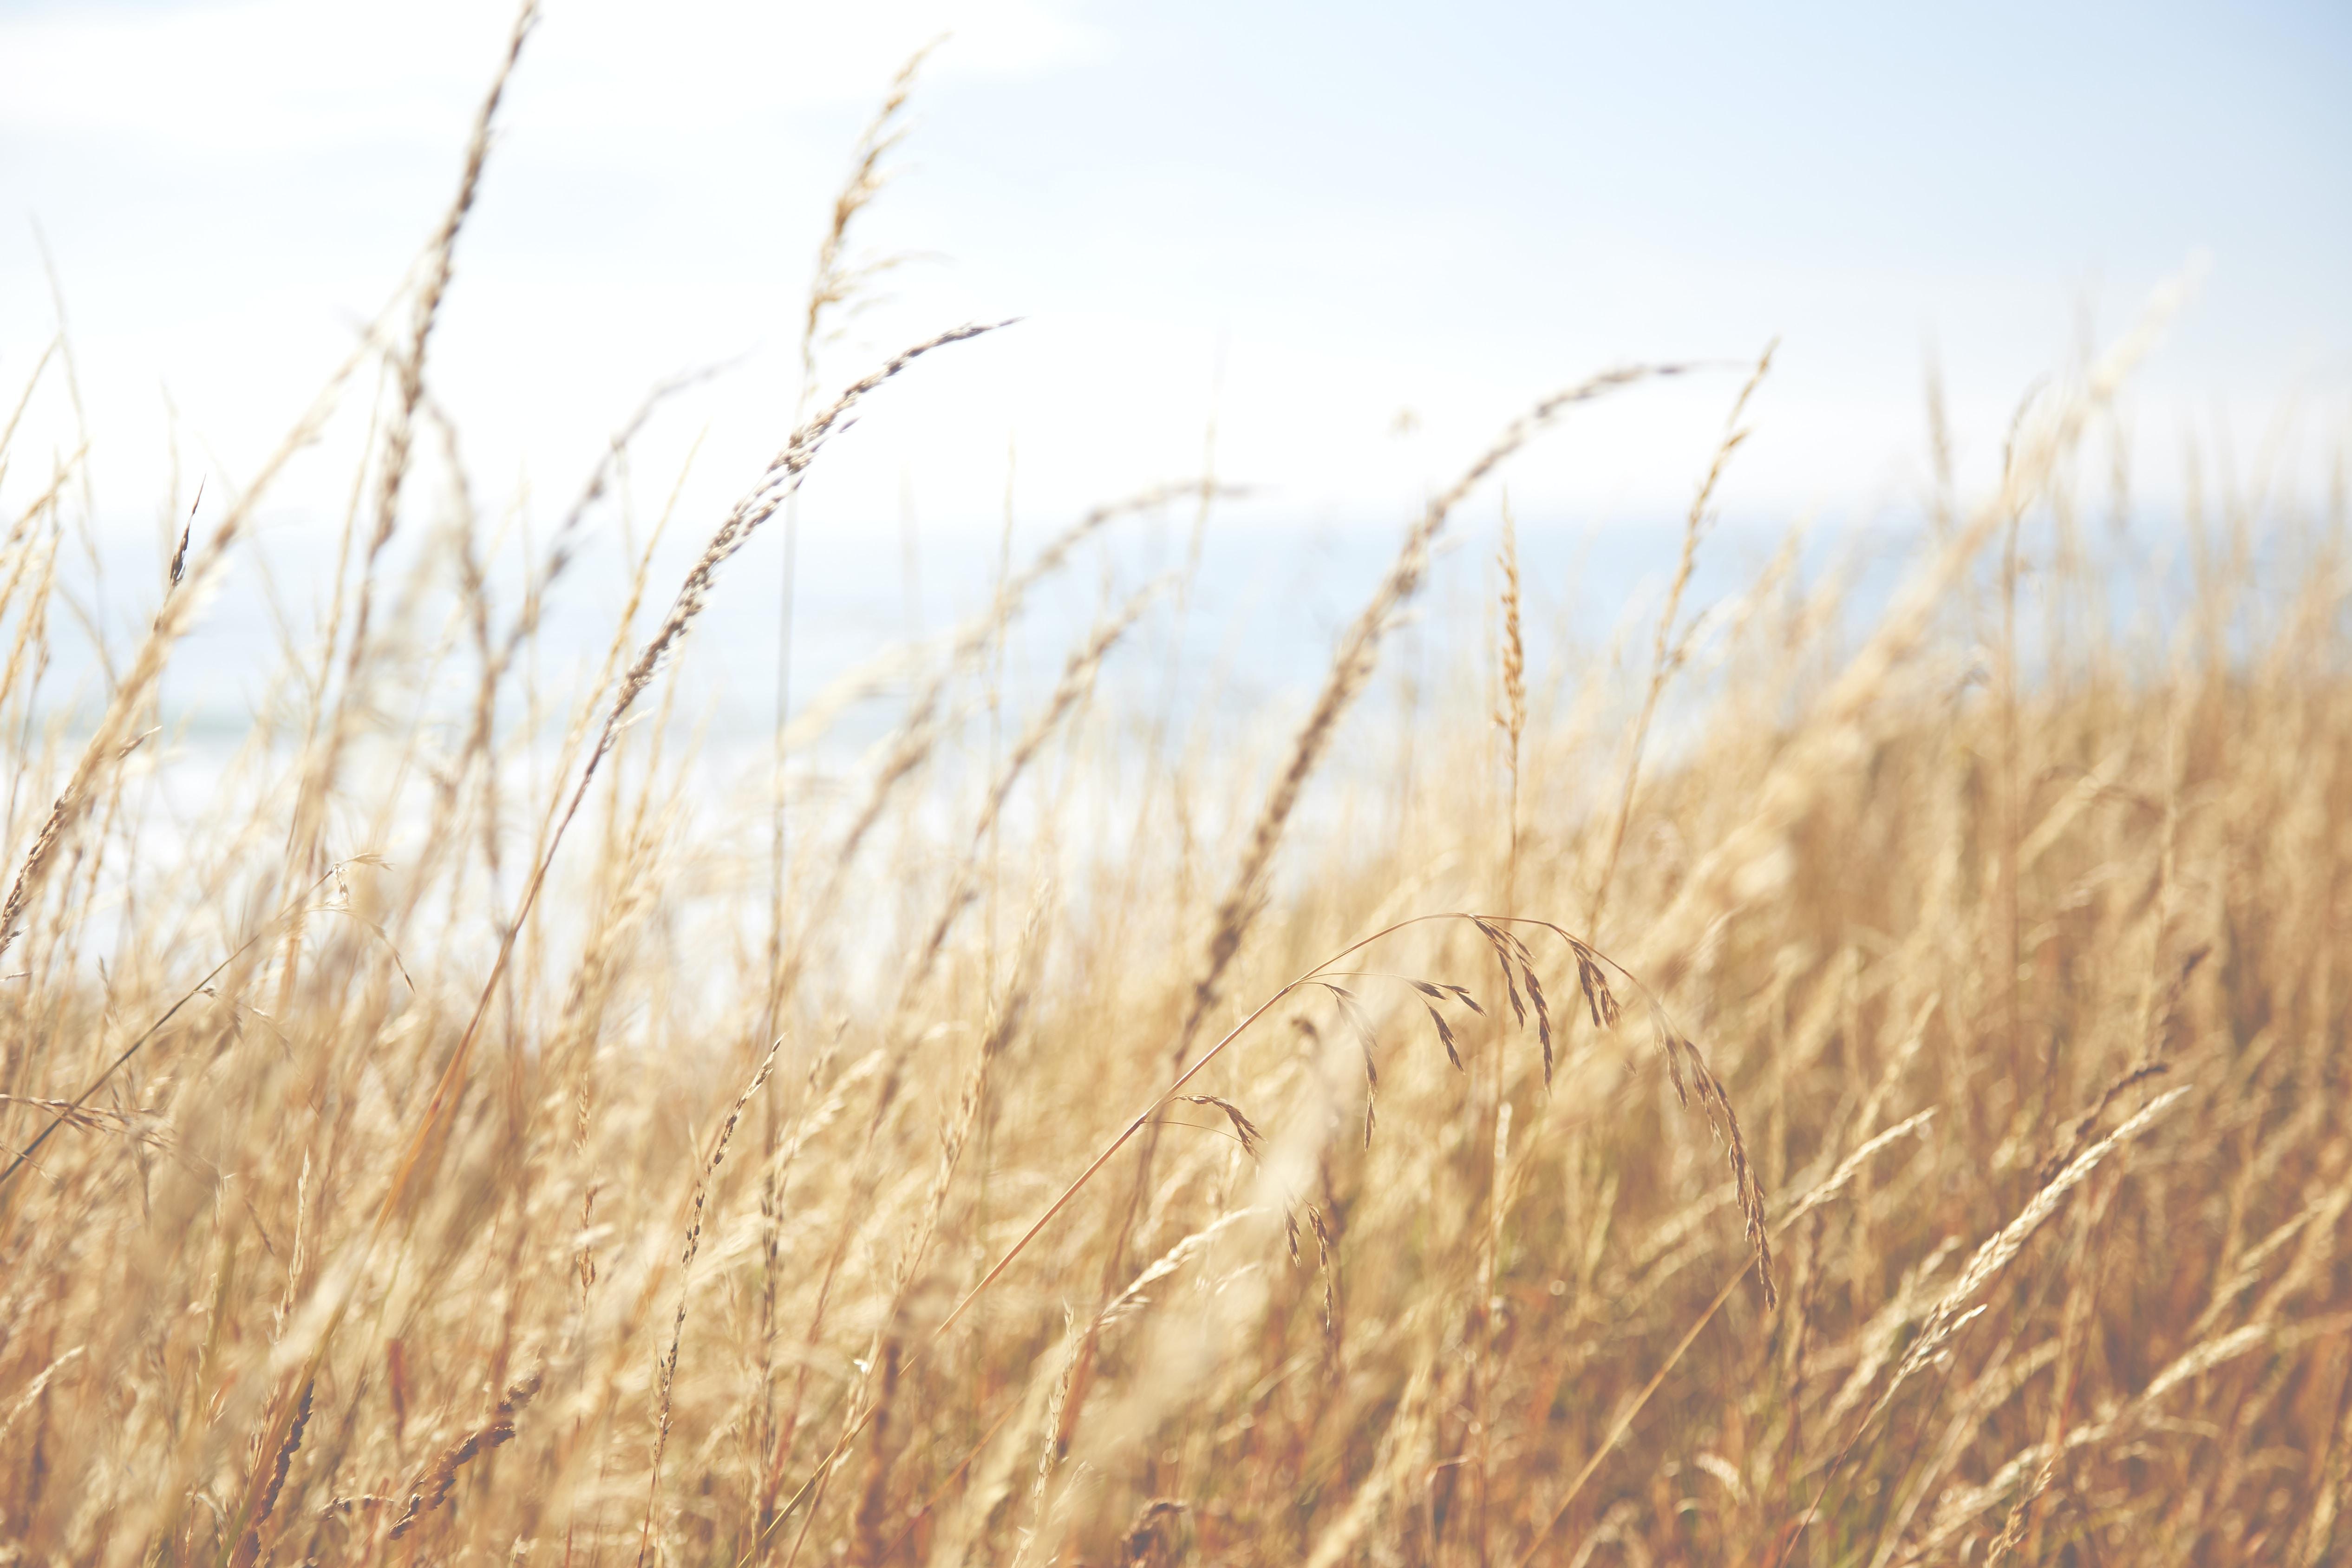 closeup photo of brown grass